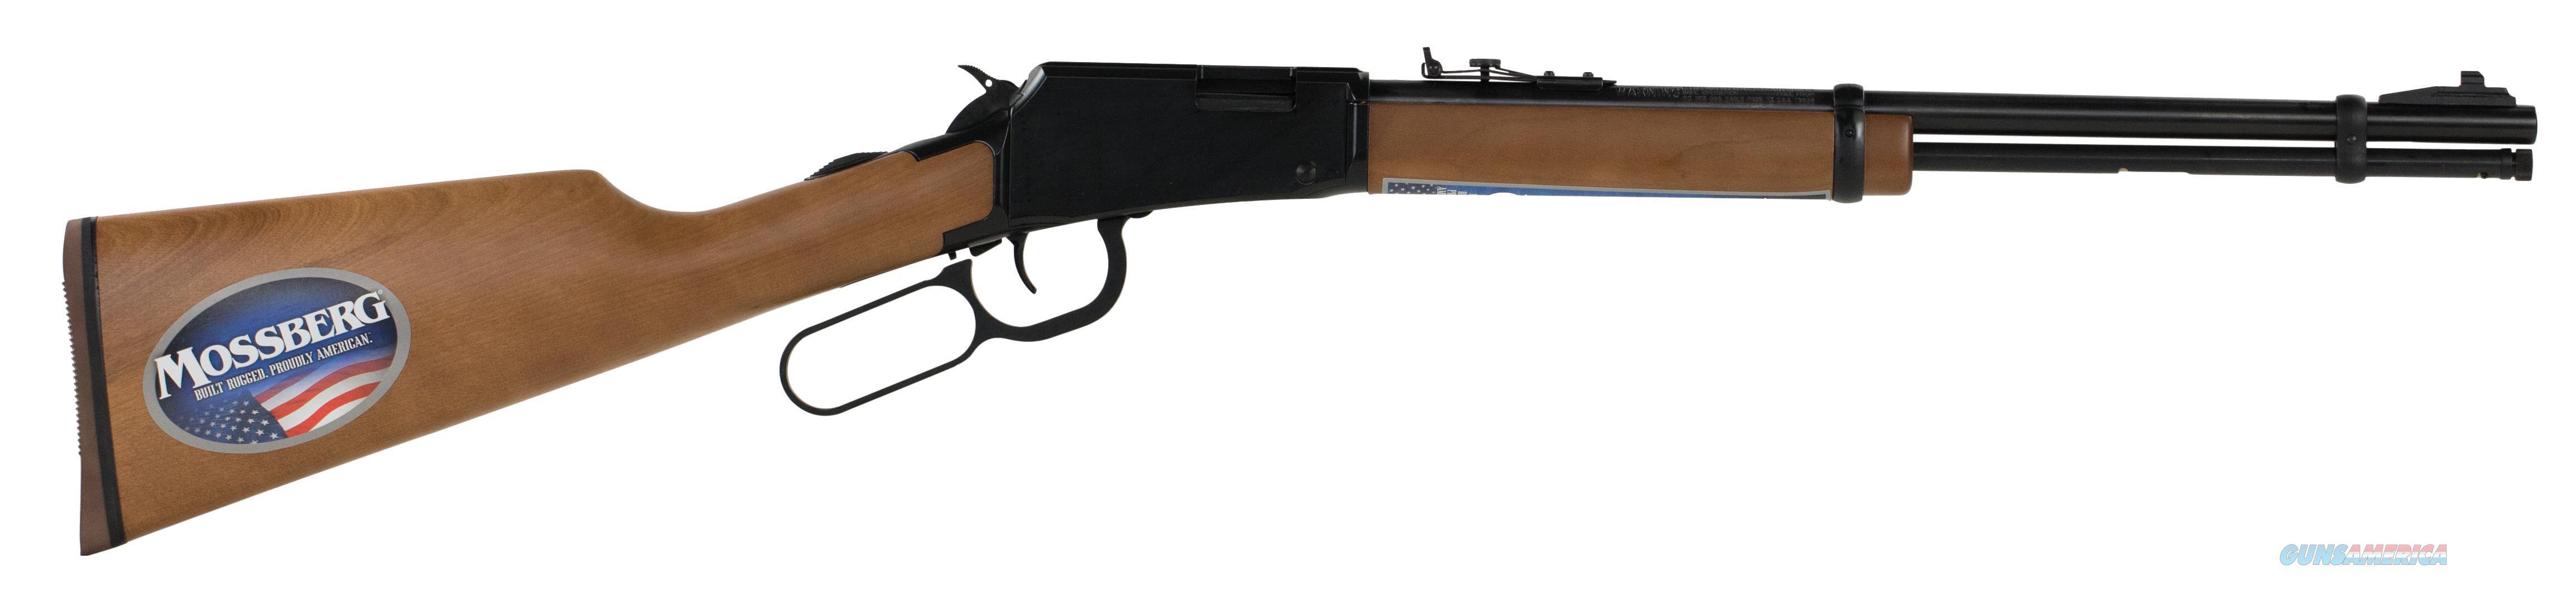 "Mossberg 43000 464 Straight Grip Lever 22 Long Rifle 18"" 14+1 Hardwood Stk Blued 43000  Guns > Rifles > MN Misc Rifles"